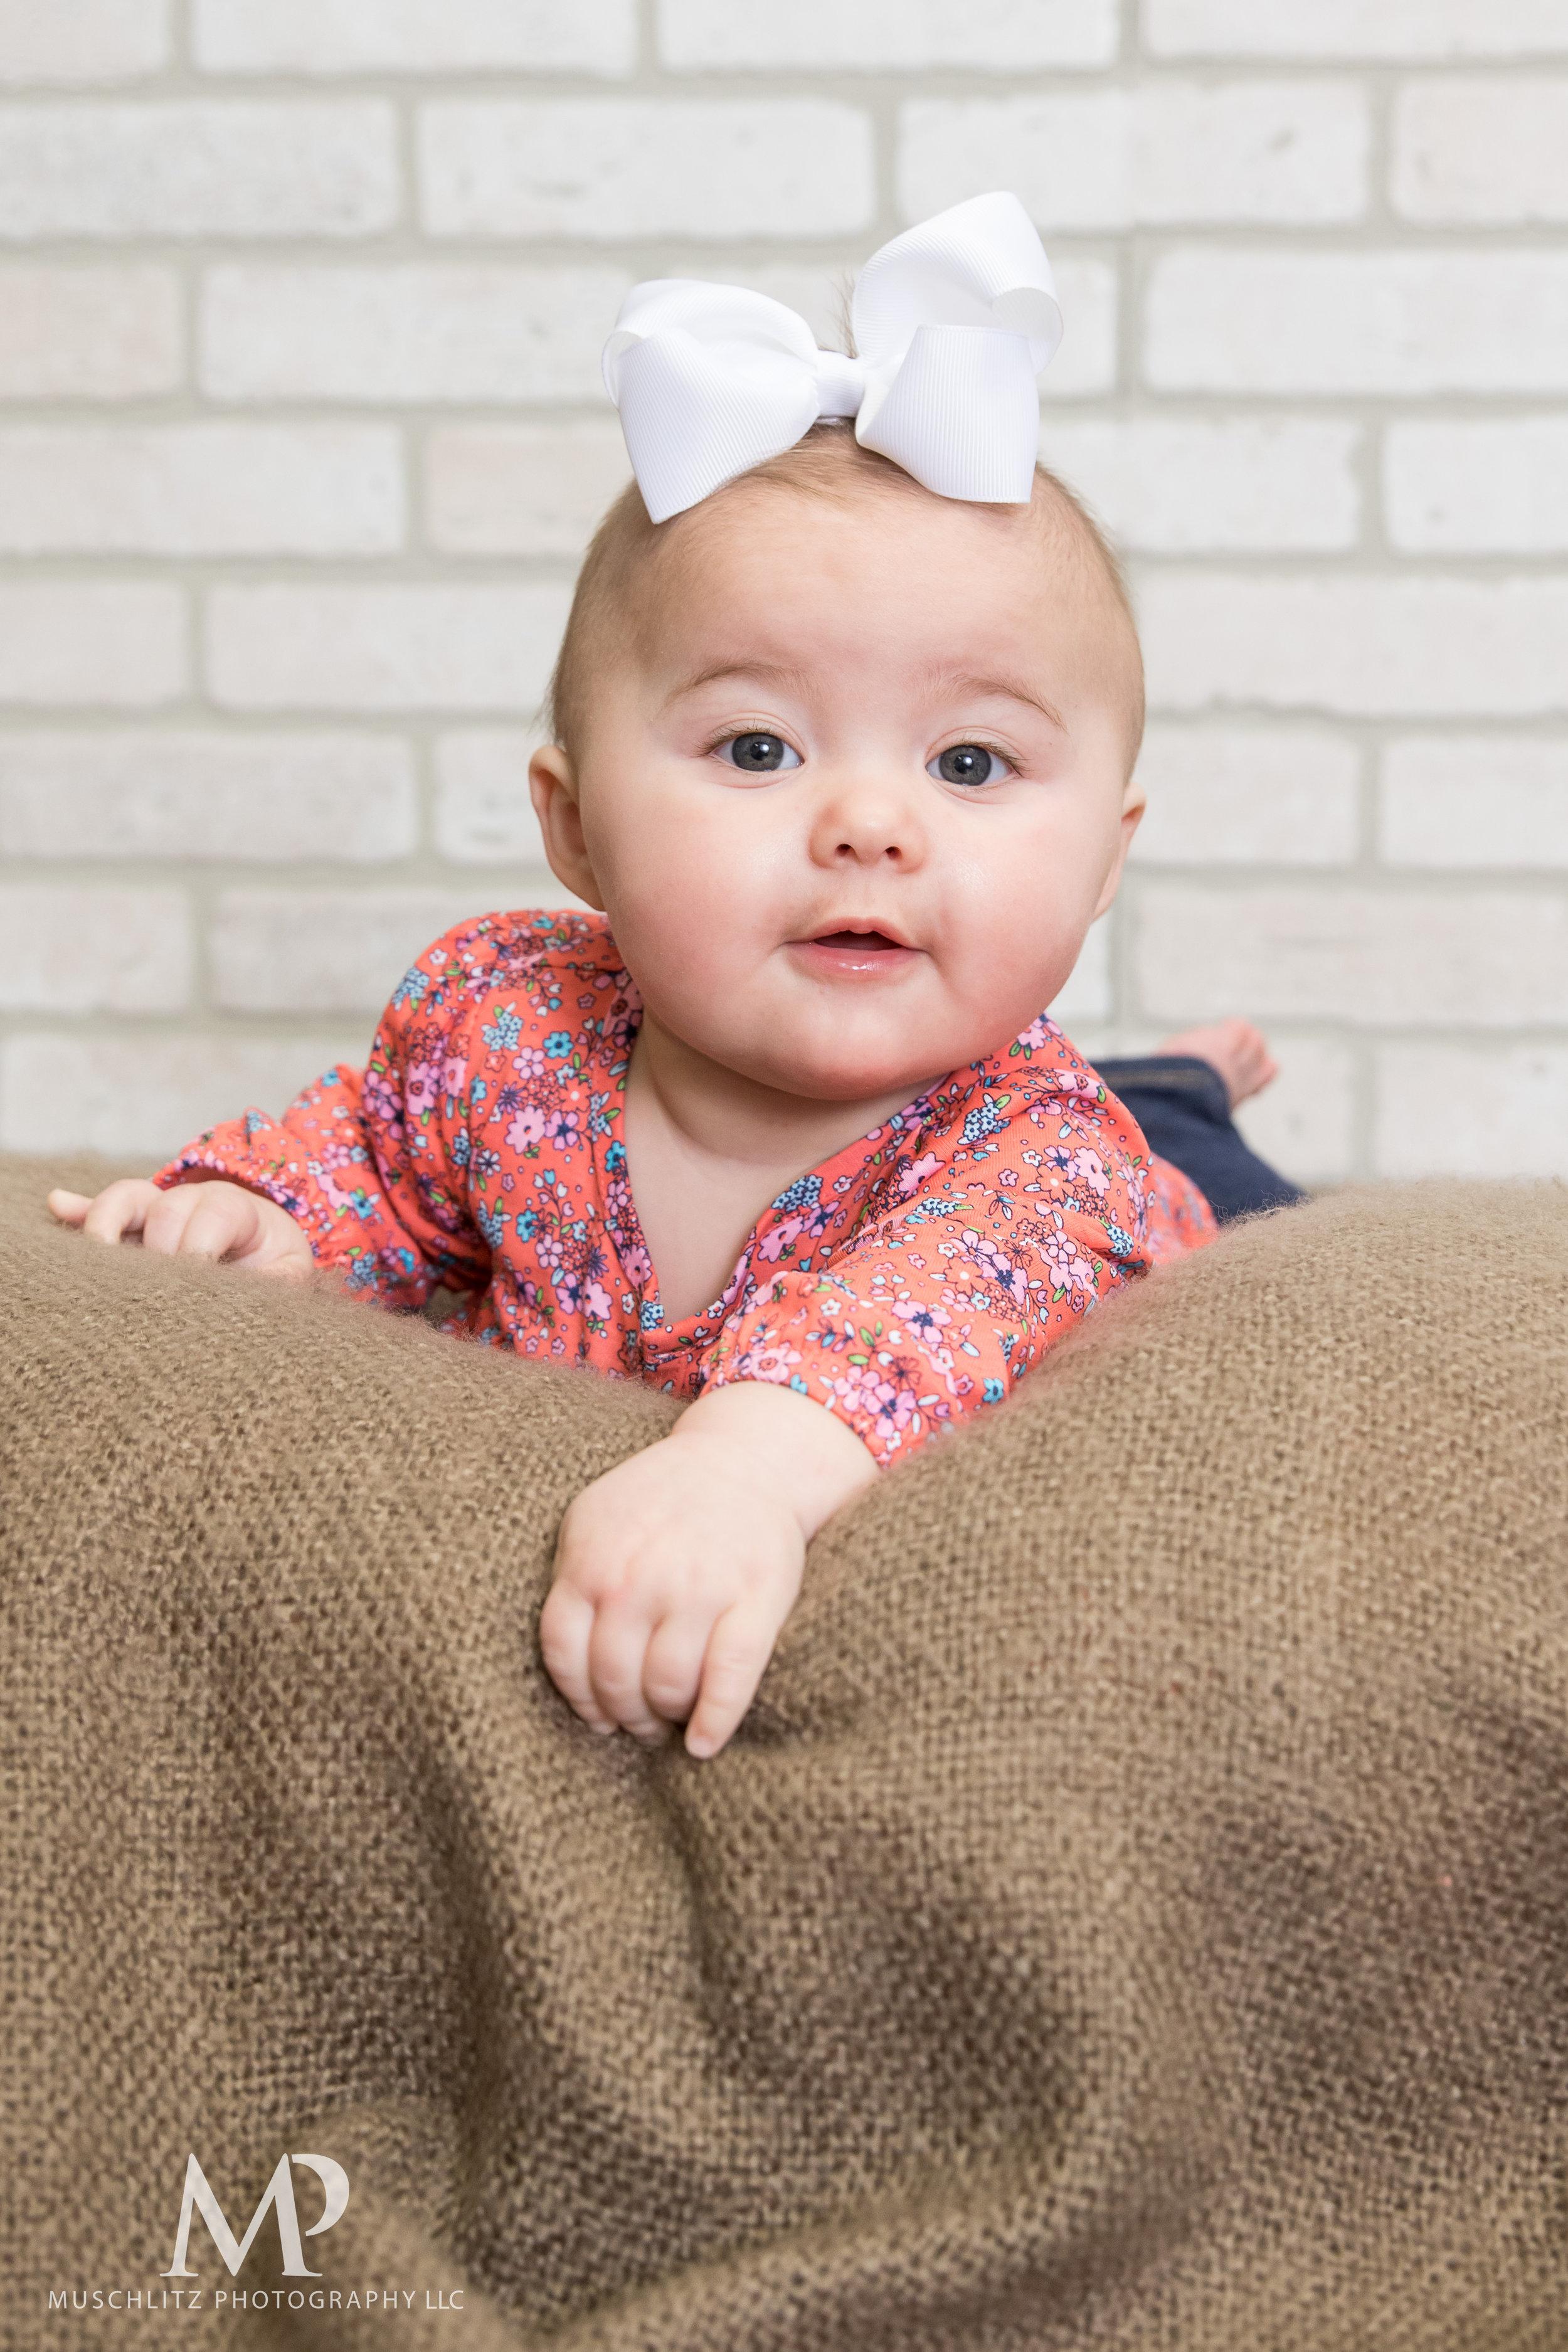 6-month-portraits-baby-photographer-columbus-ohio-gahanna-muschlitz-photography-004.JPG